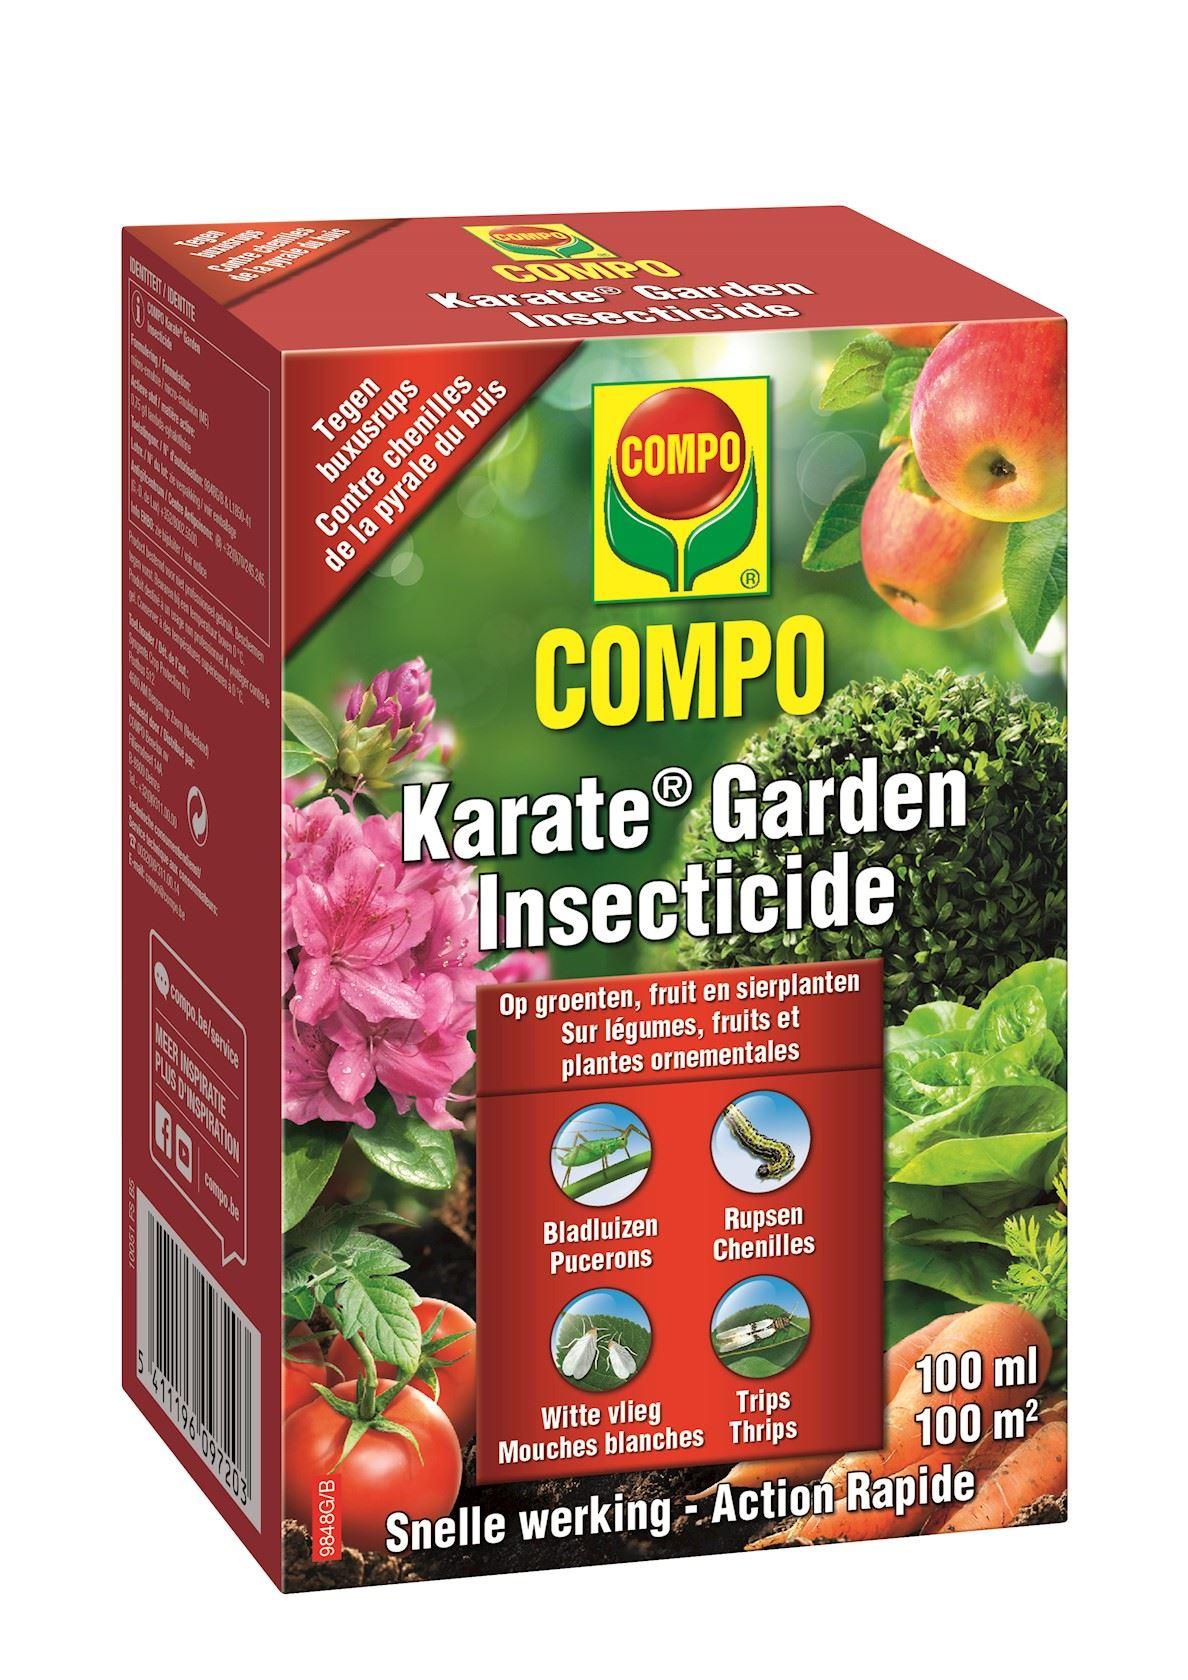 Compo karate garden concentraat - 100ml